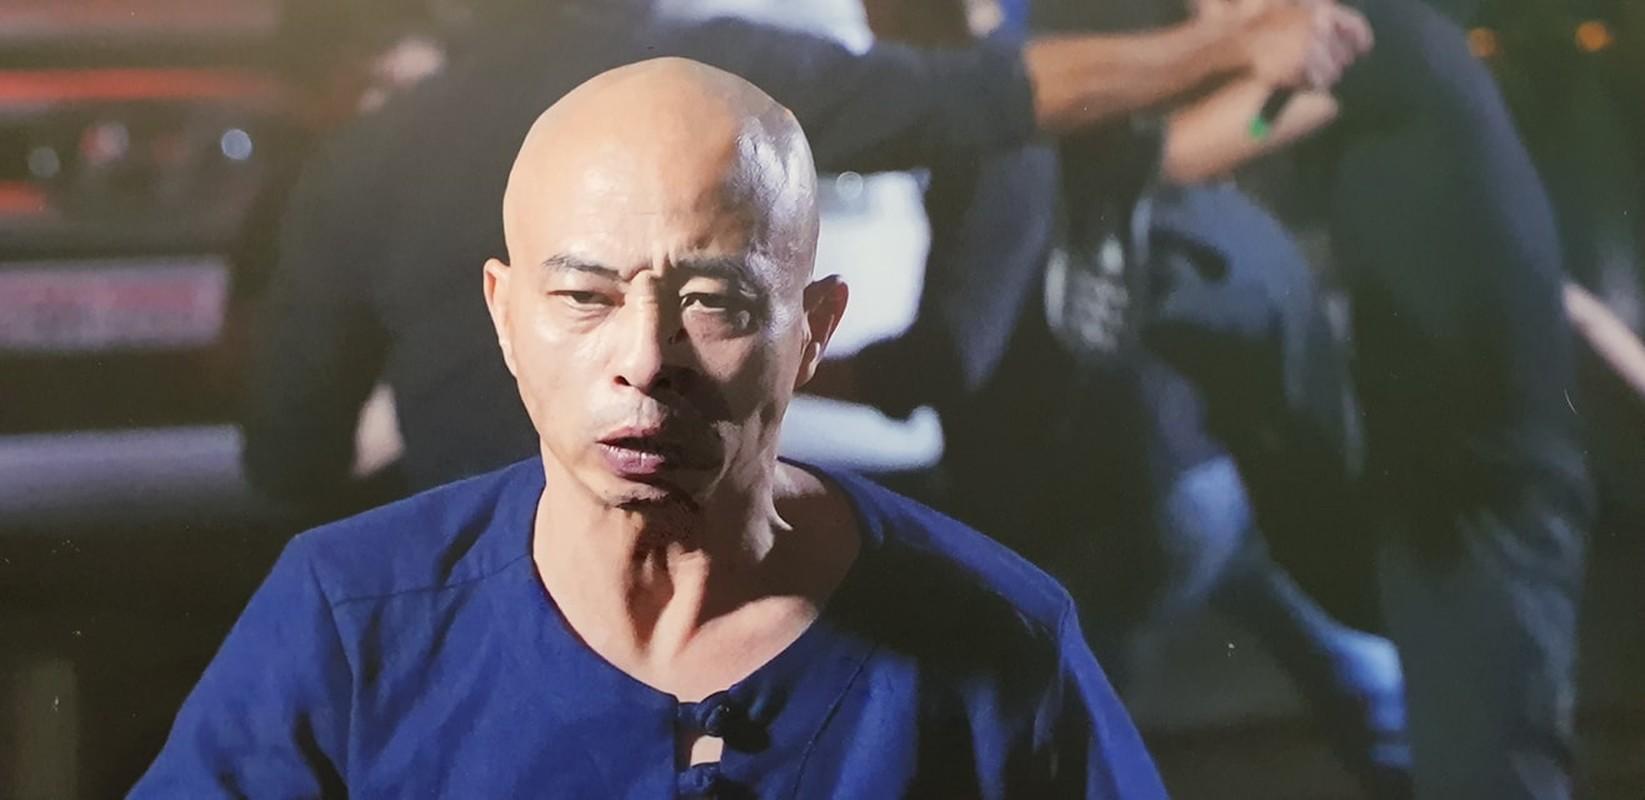 Trum giang ho Duong Nhue bi bat: Tam giam them 2 dan em mau mat o Thai Binh-Hinh-4